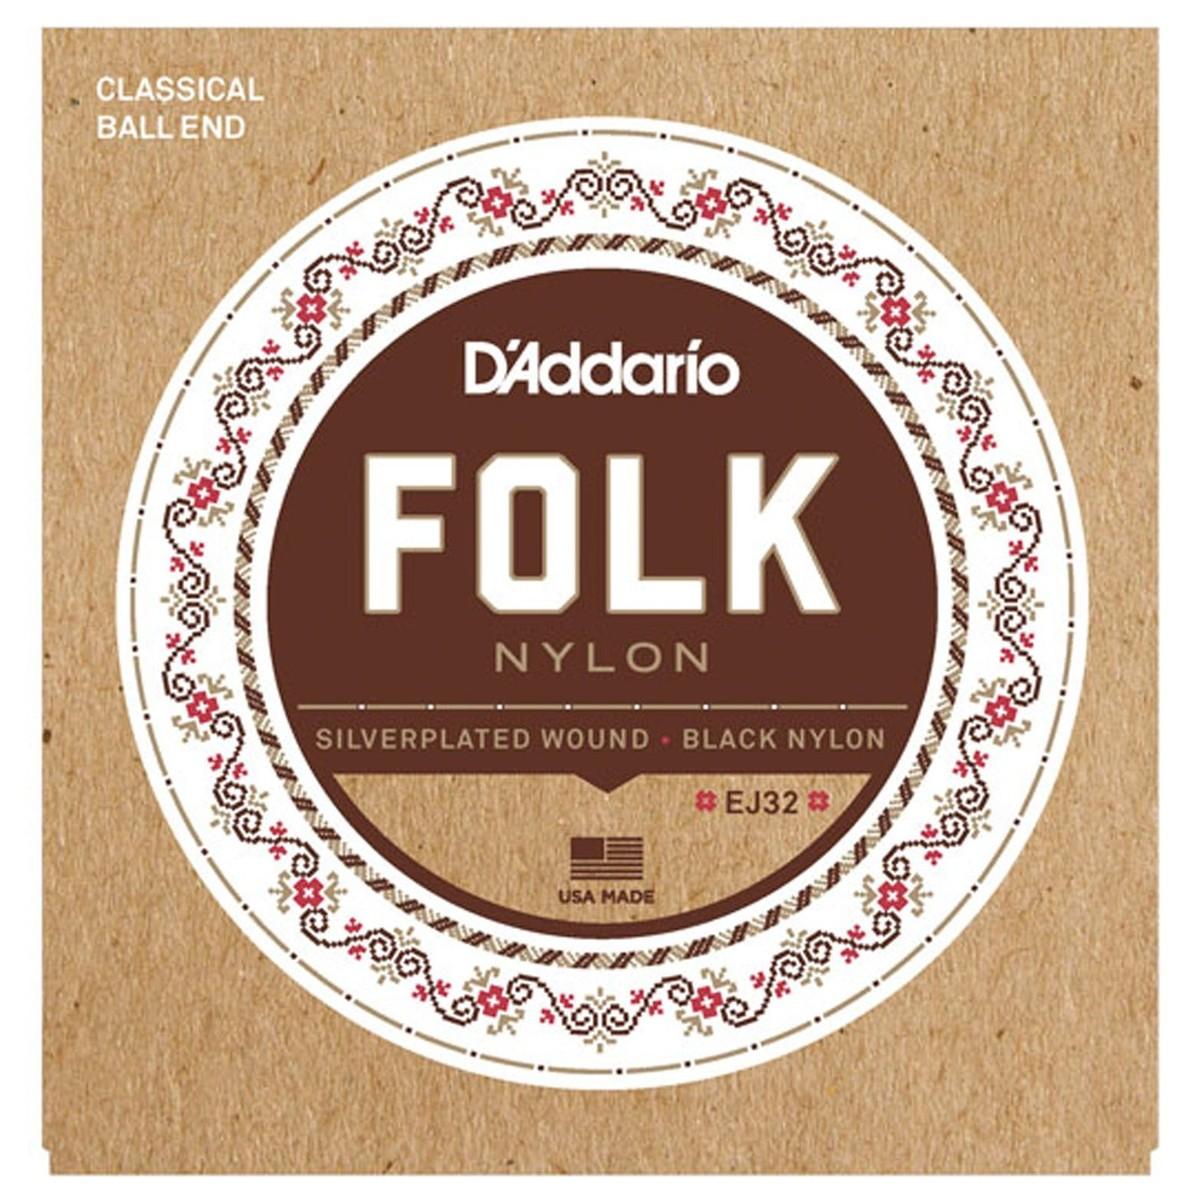 D'Addario EJ32 Folk Nylon Classical Guitar Strings with ...